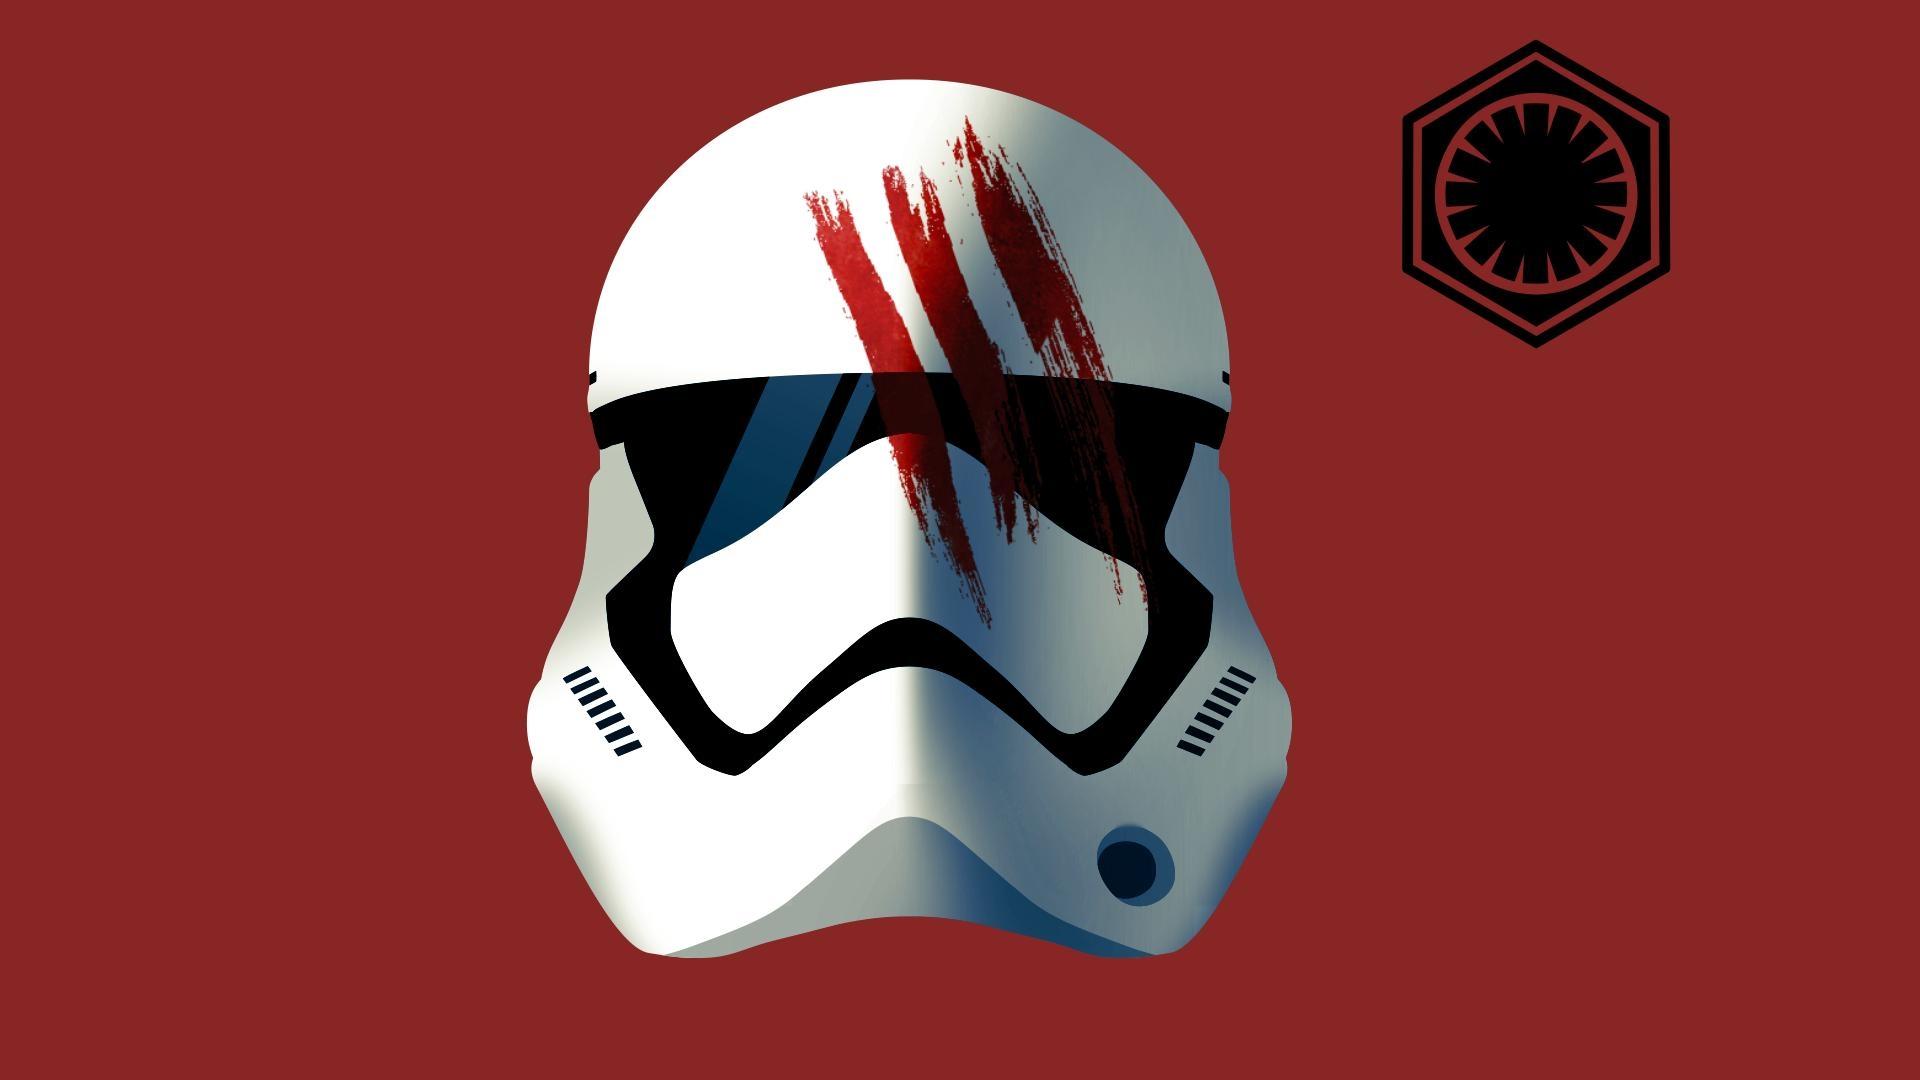 Обои На Рабочий Стол Star Wars